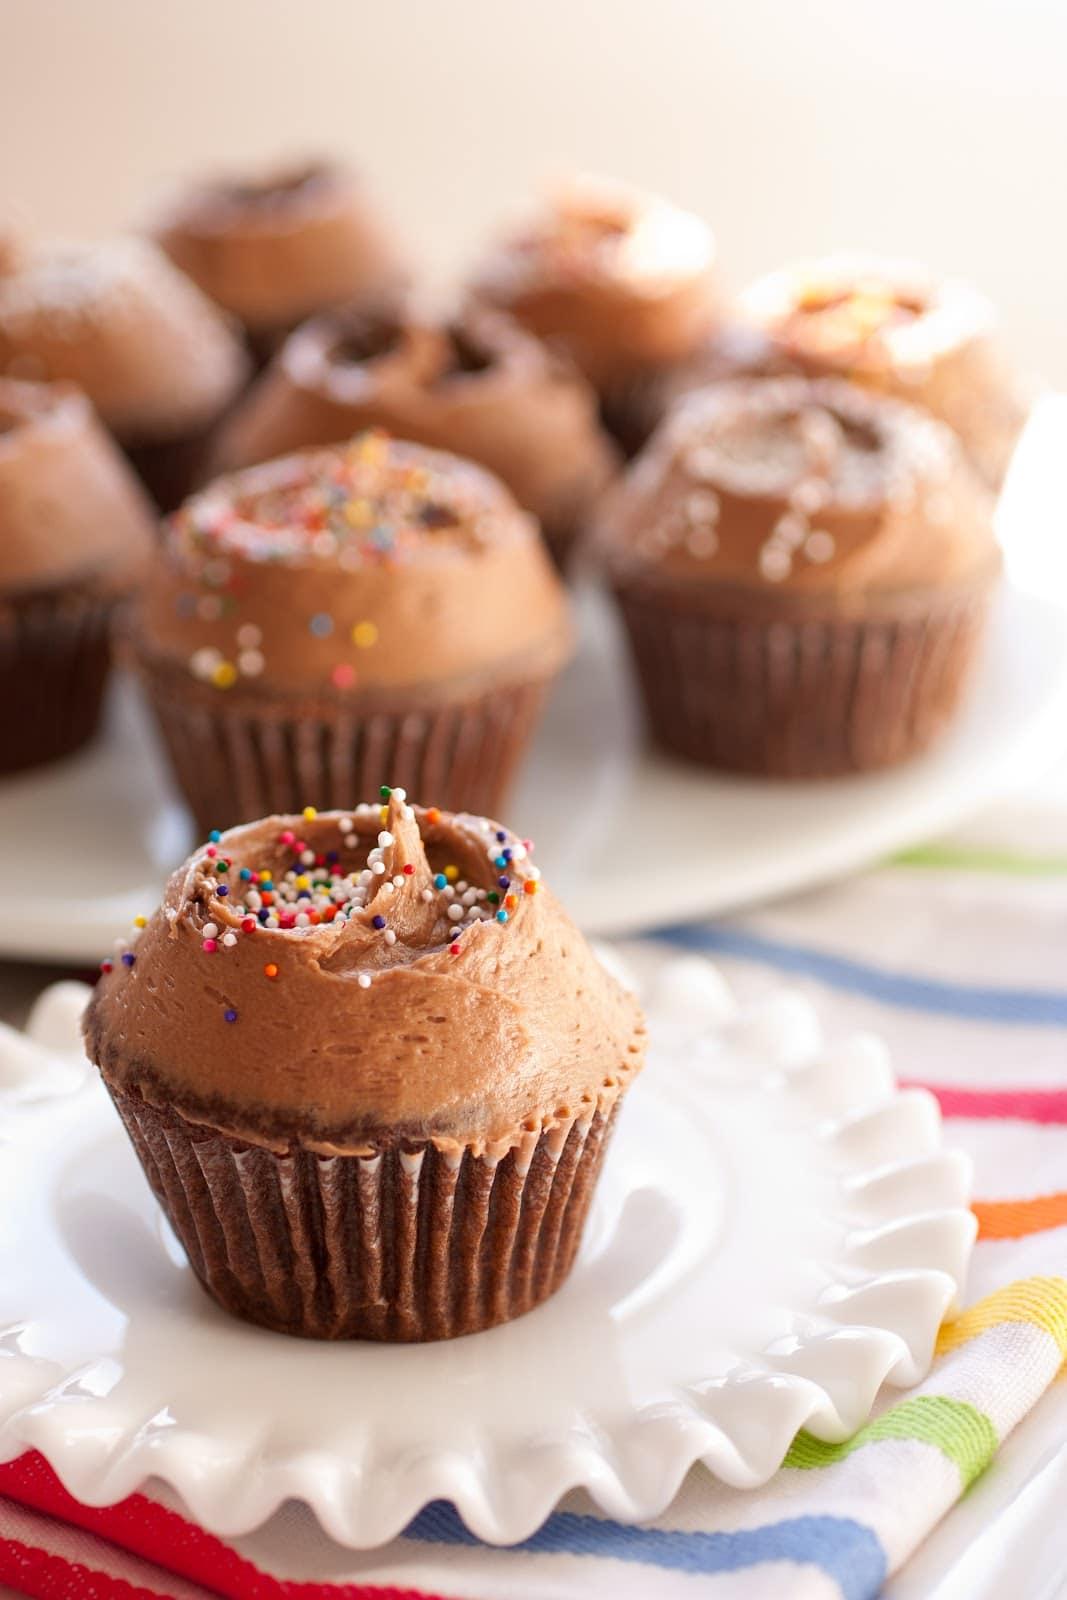 Chocolate cupcakes with chocolate cream cheese frosting for Chocolate fudge cream cheese frosting